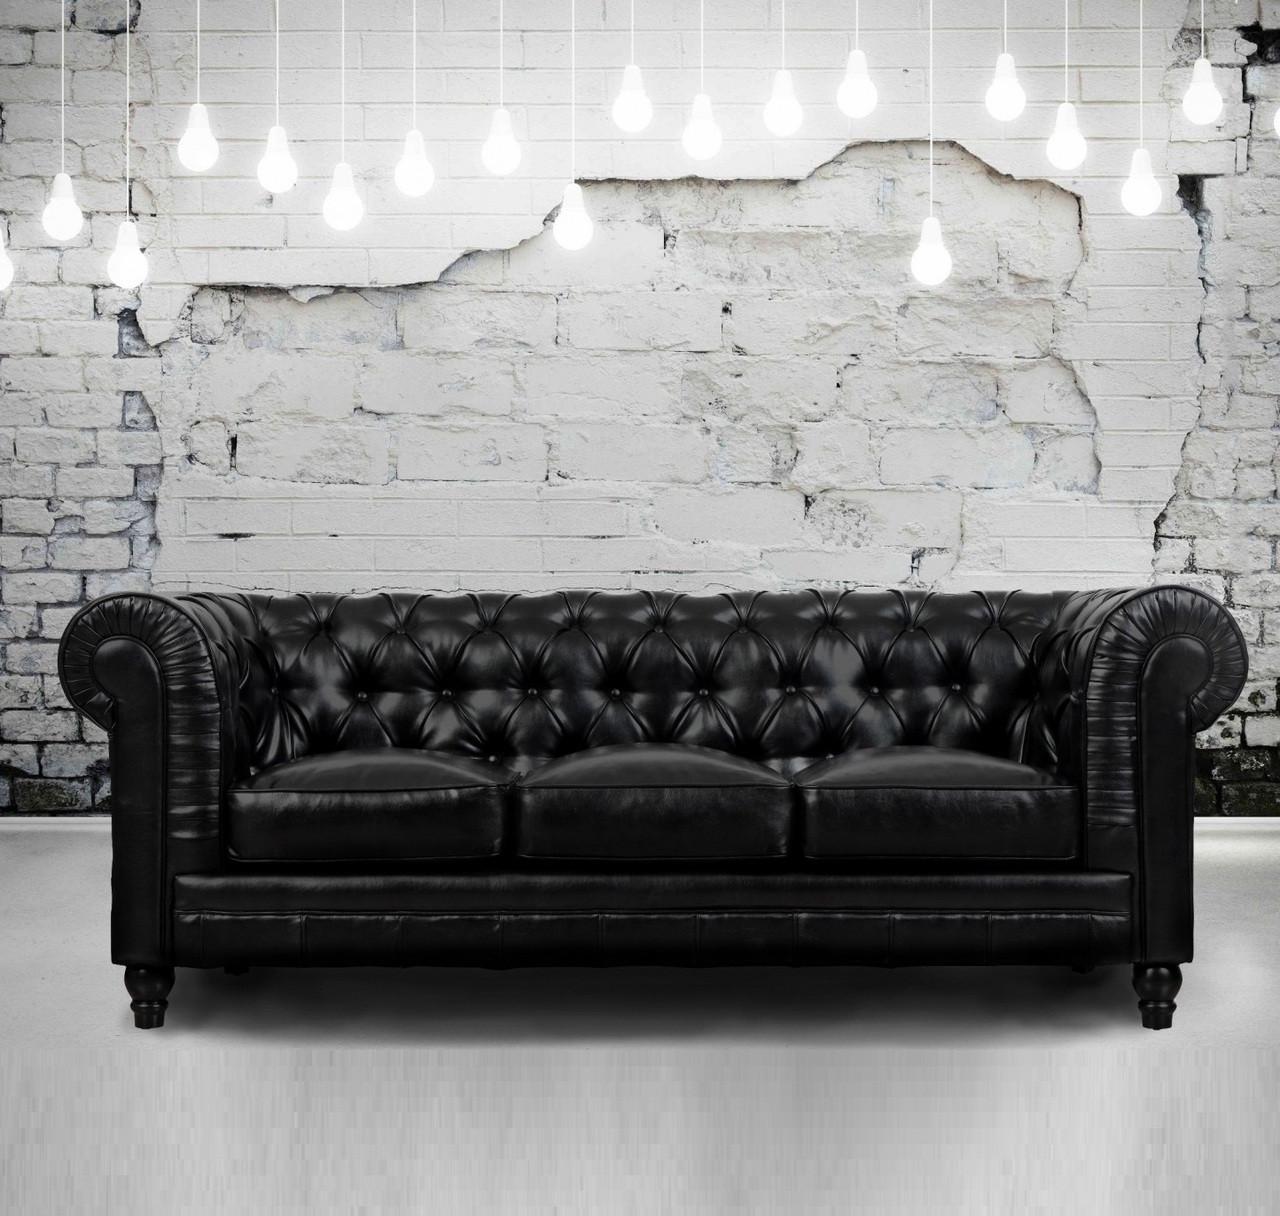 Zahara Tufted Black Leather Chesterfield Sofa Zin Home